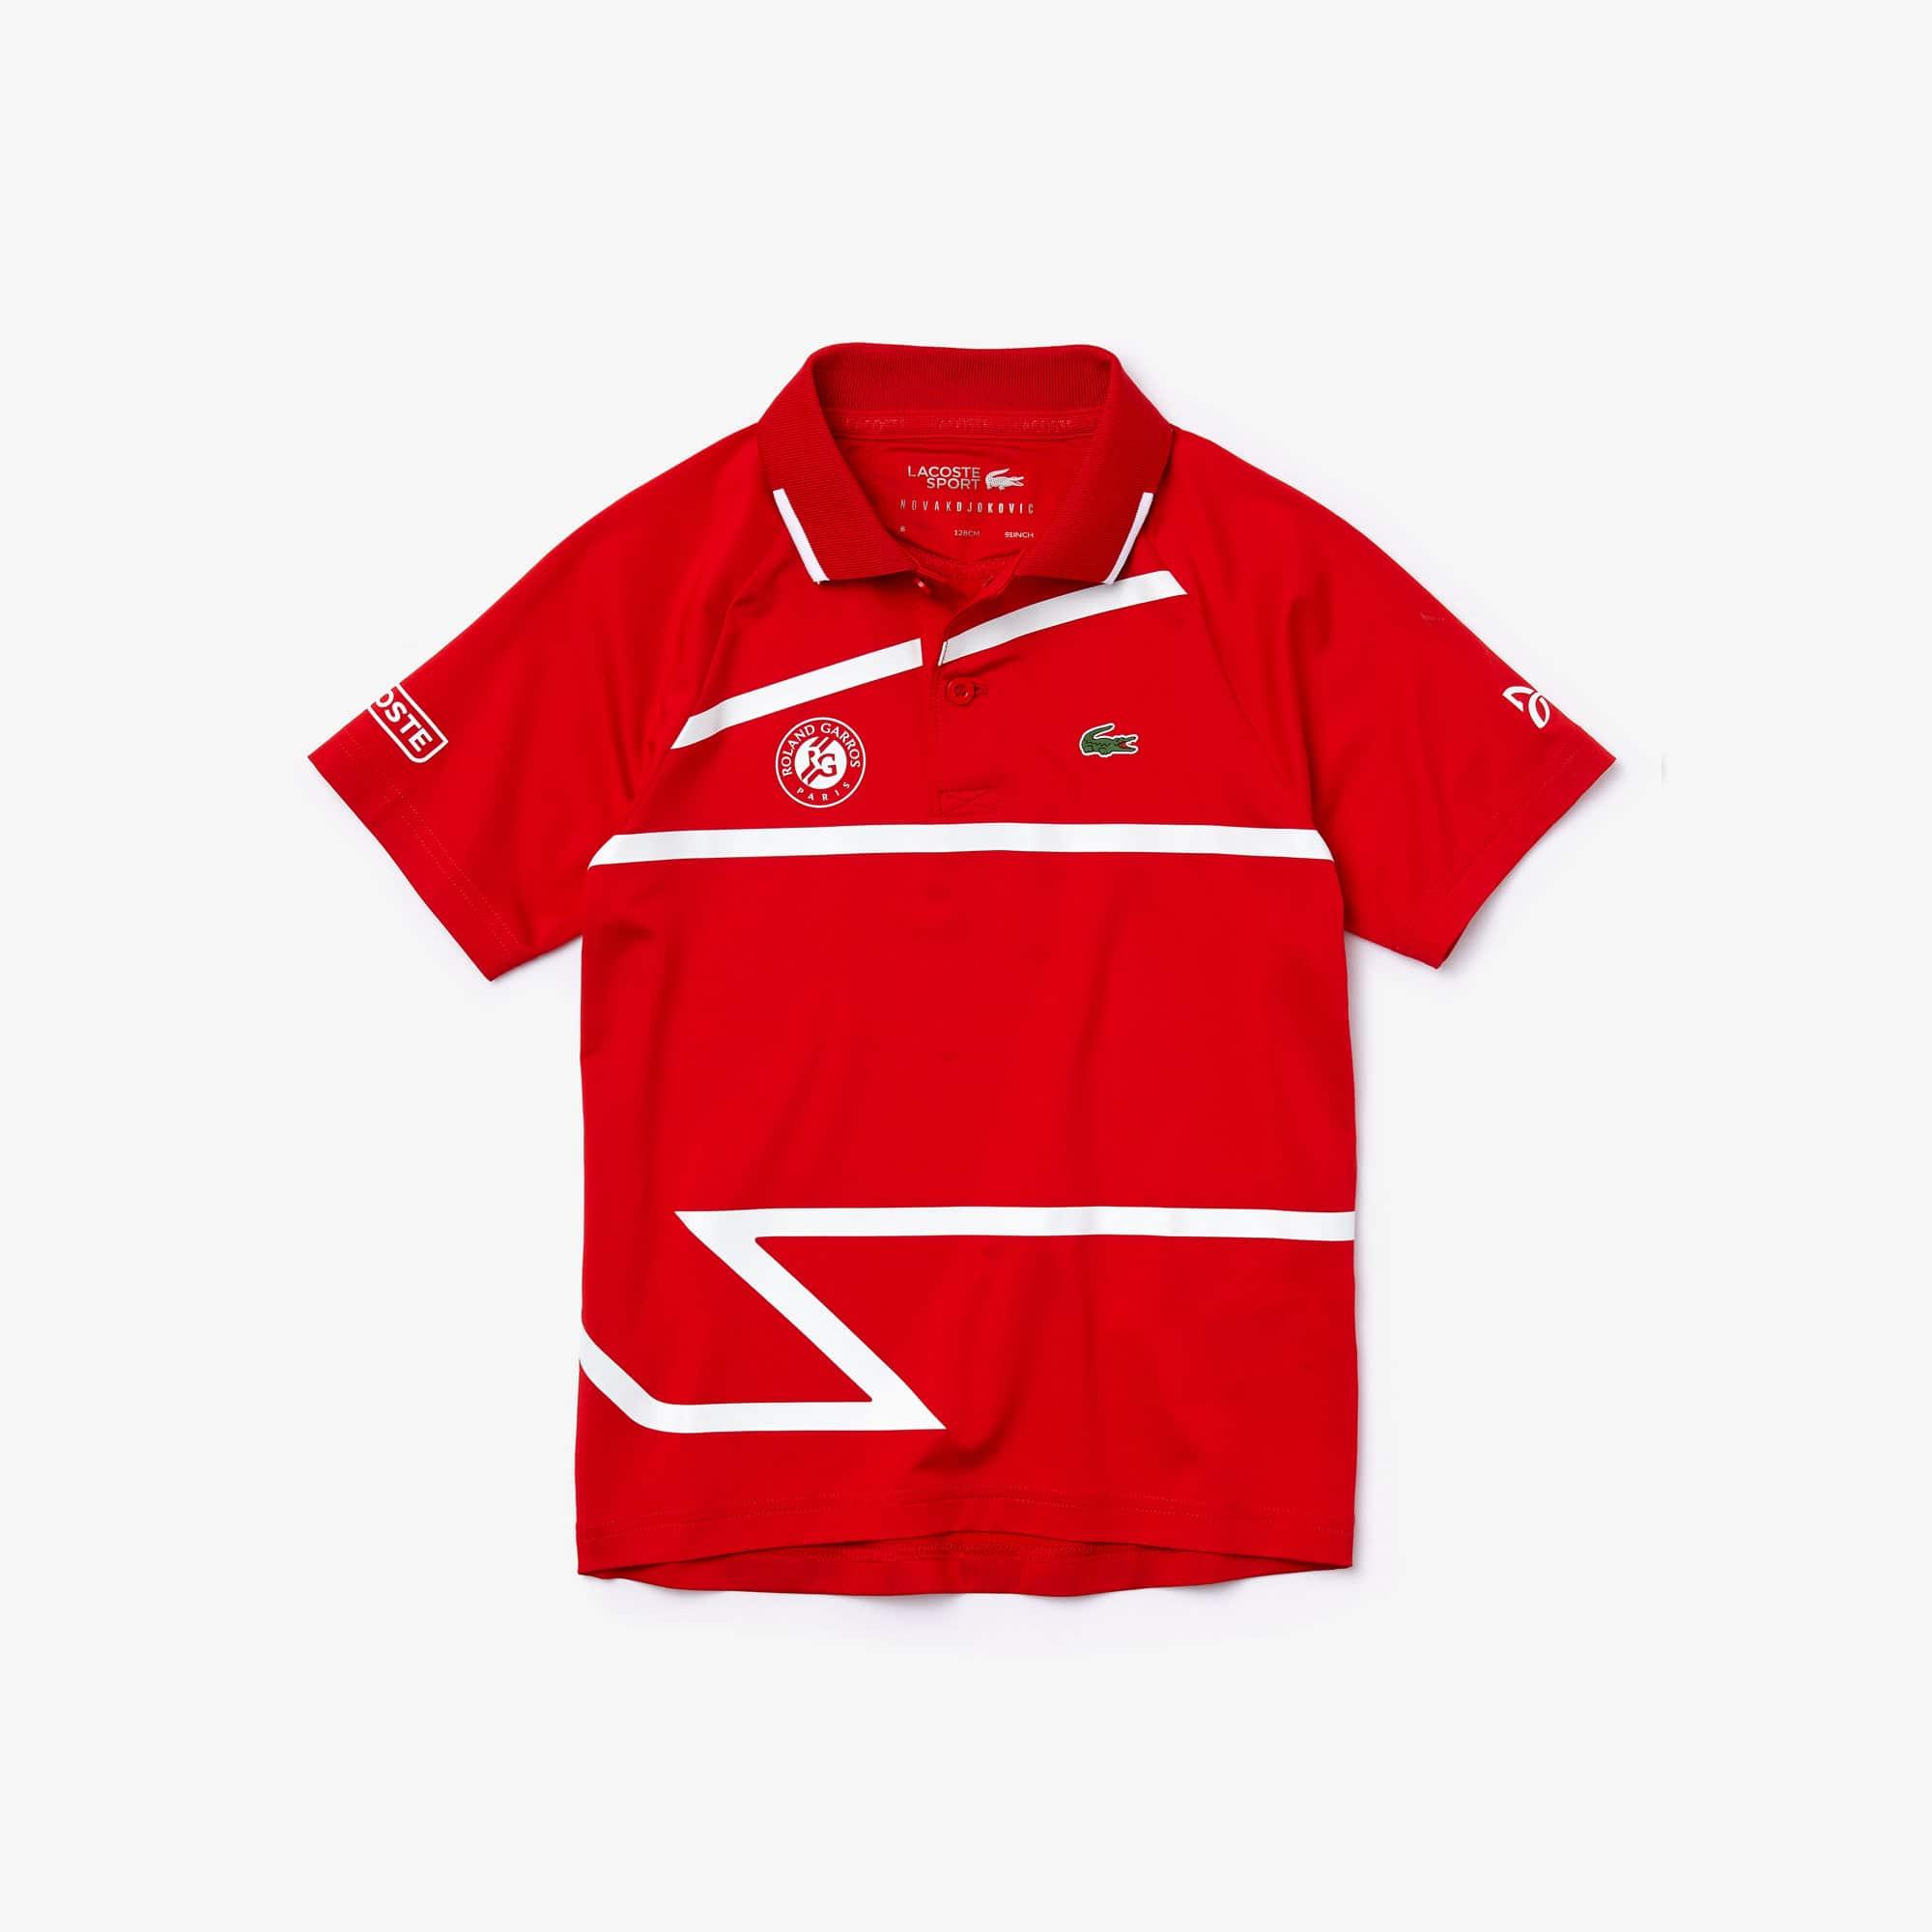 Boys Lacoste Sport Roland Garros X Novak Djokovic Polo Shirt Lacoste